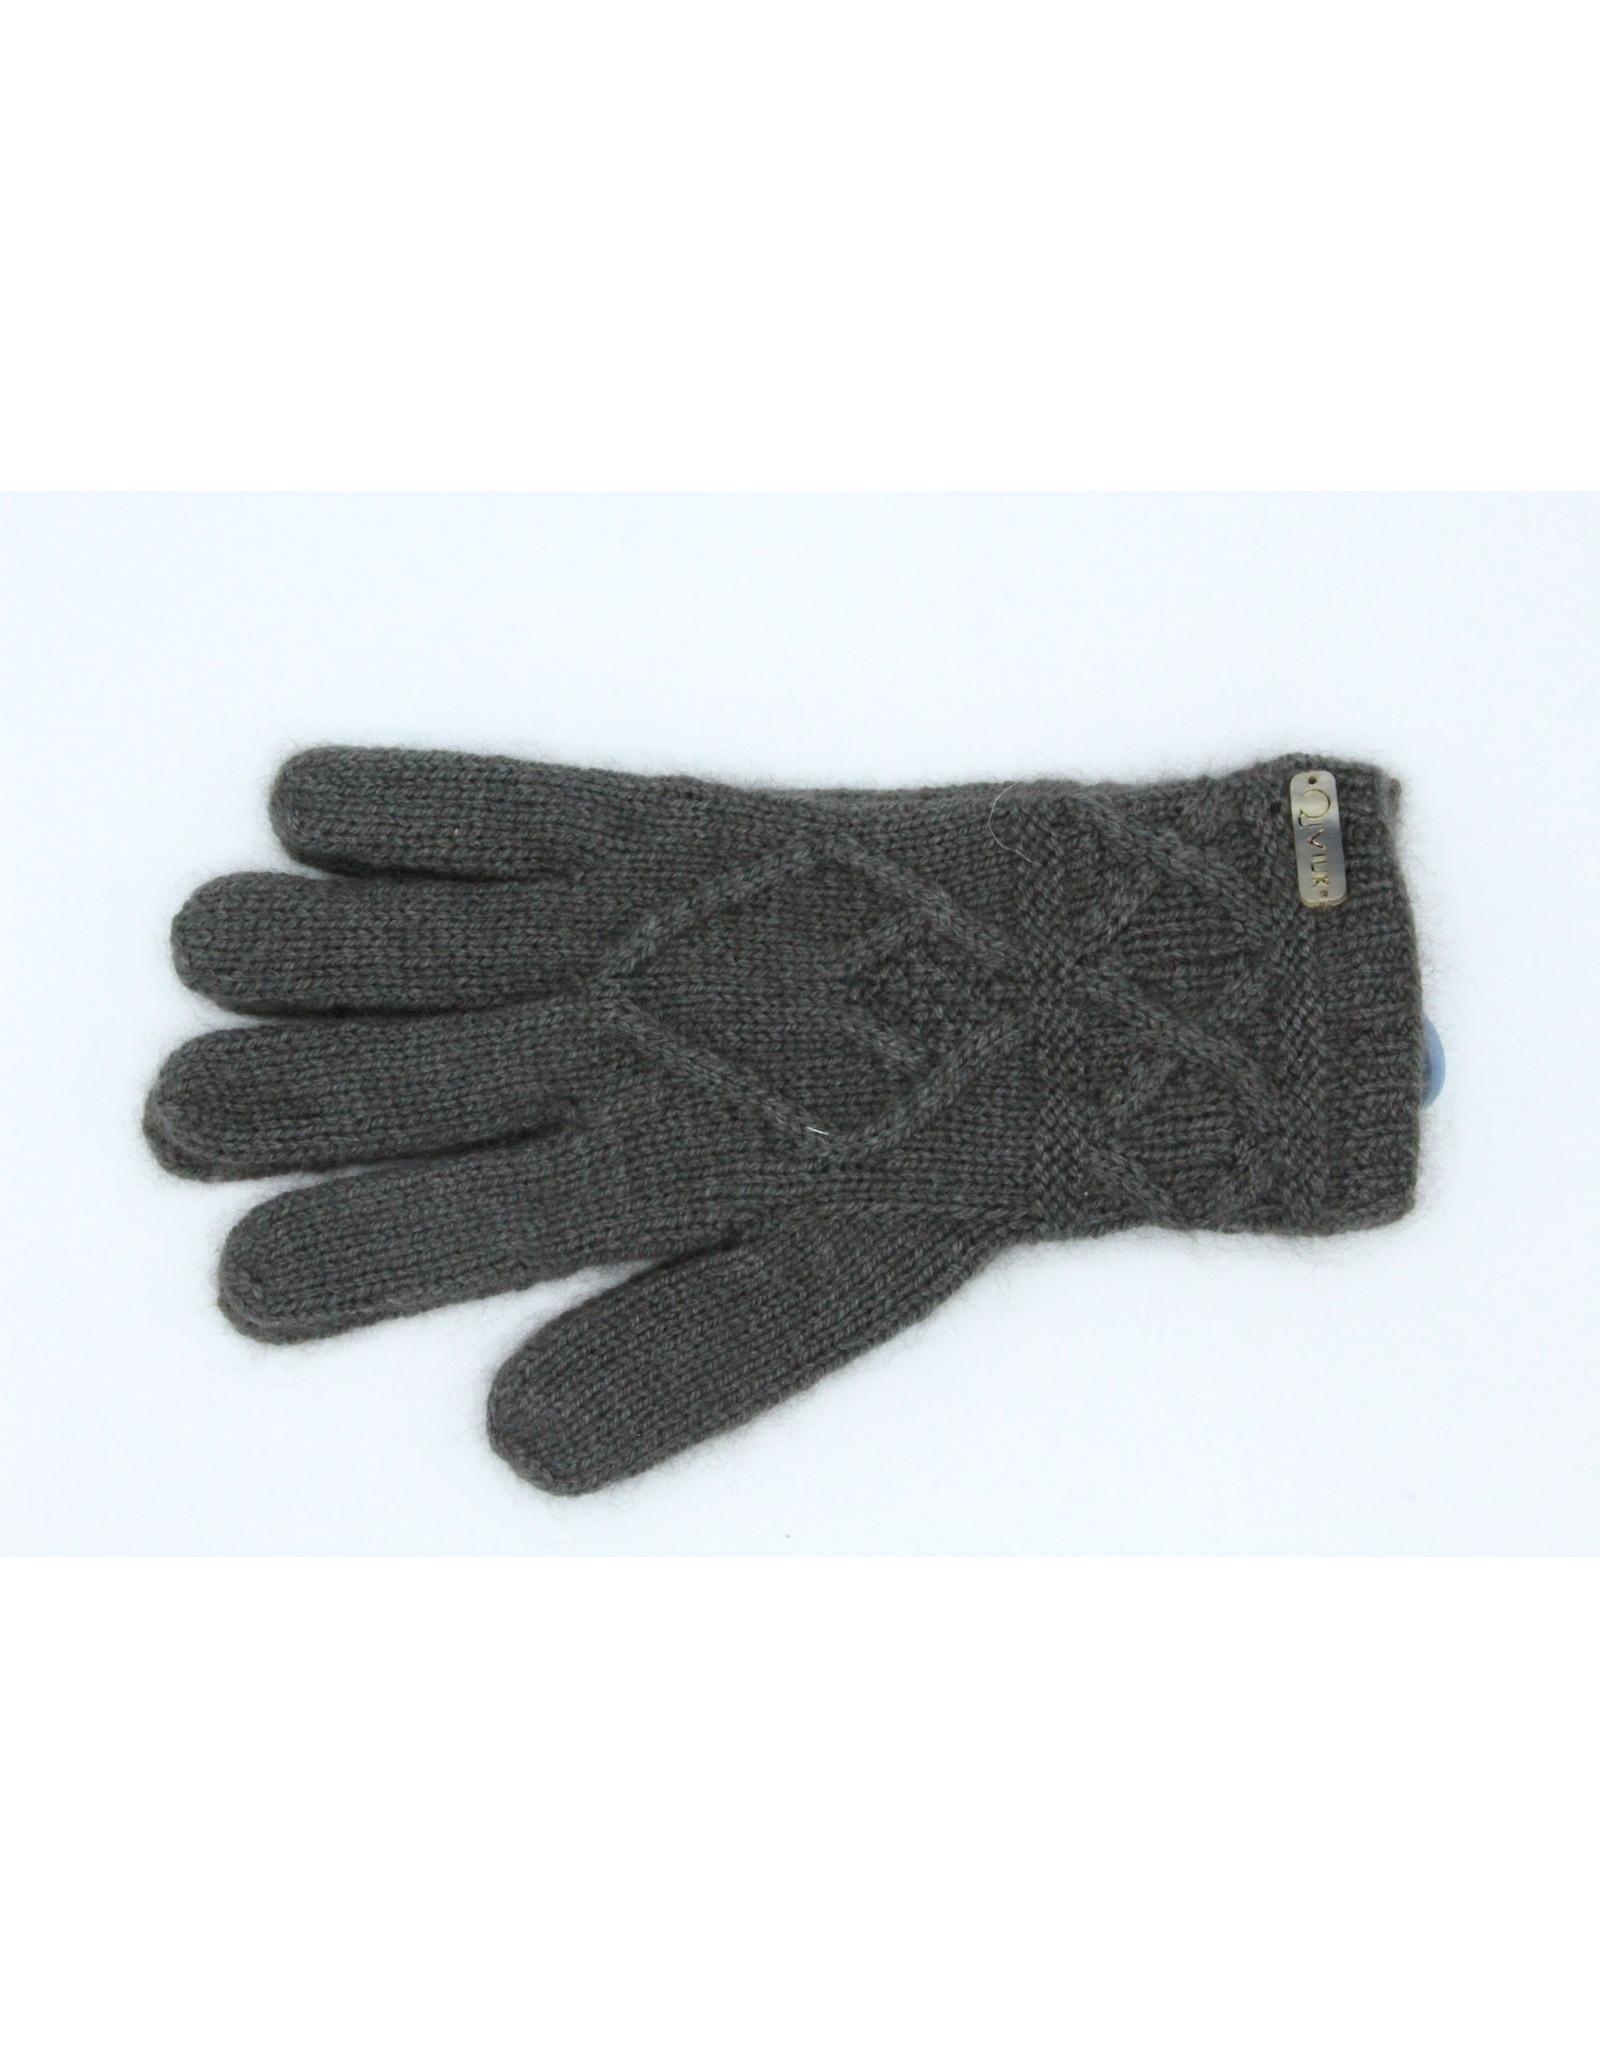 Mena Gloves - 45% Qiviuk 45% Merino 10% Silk